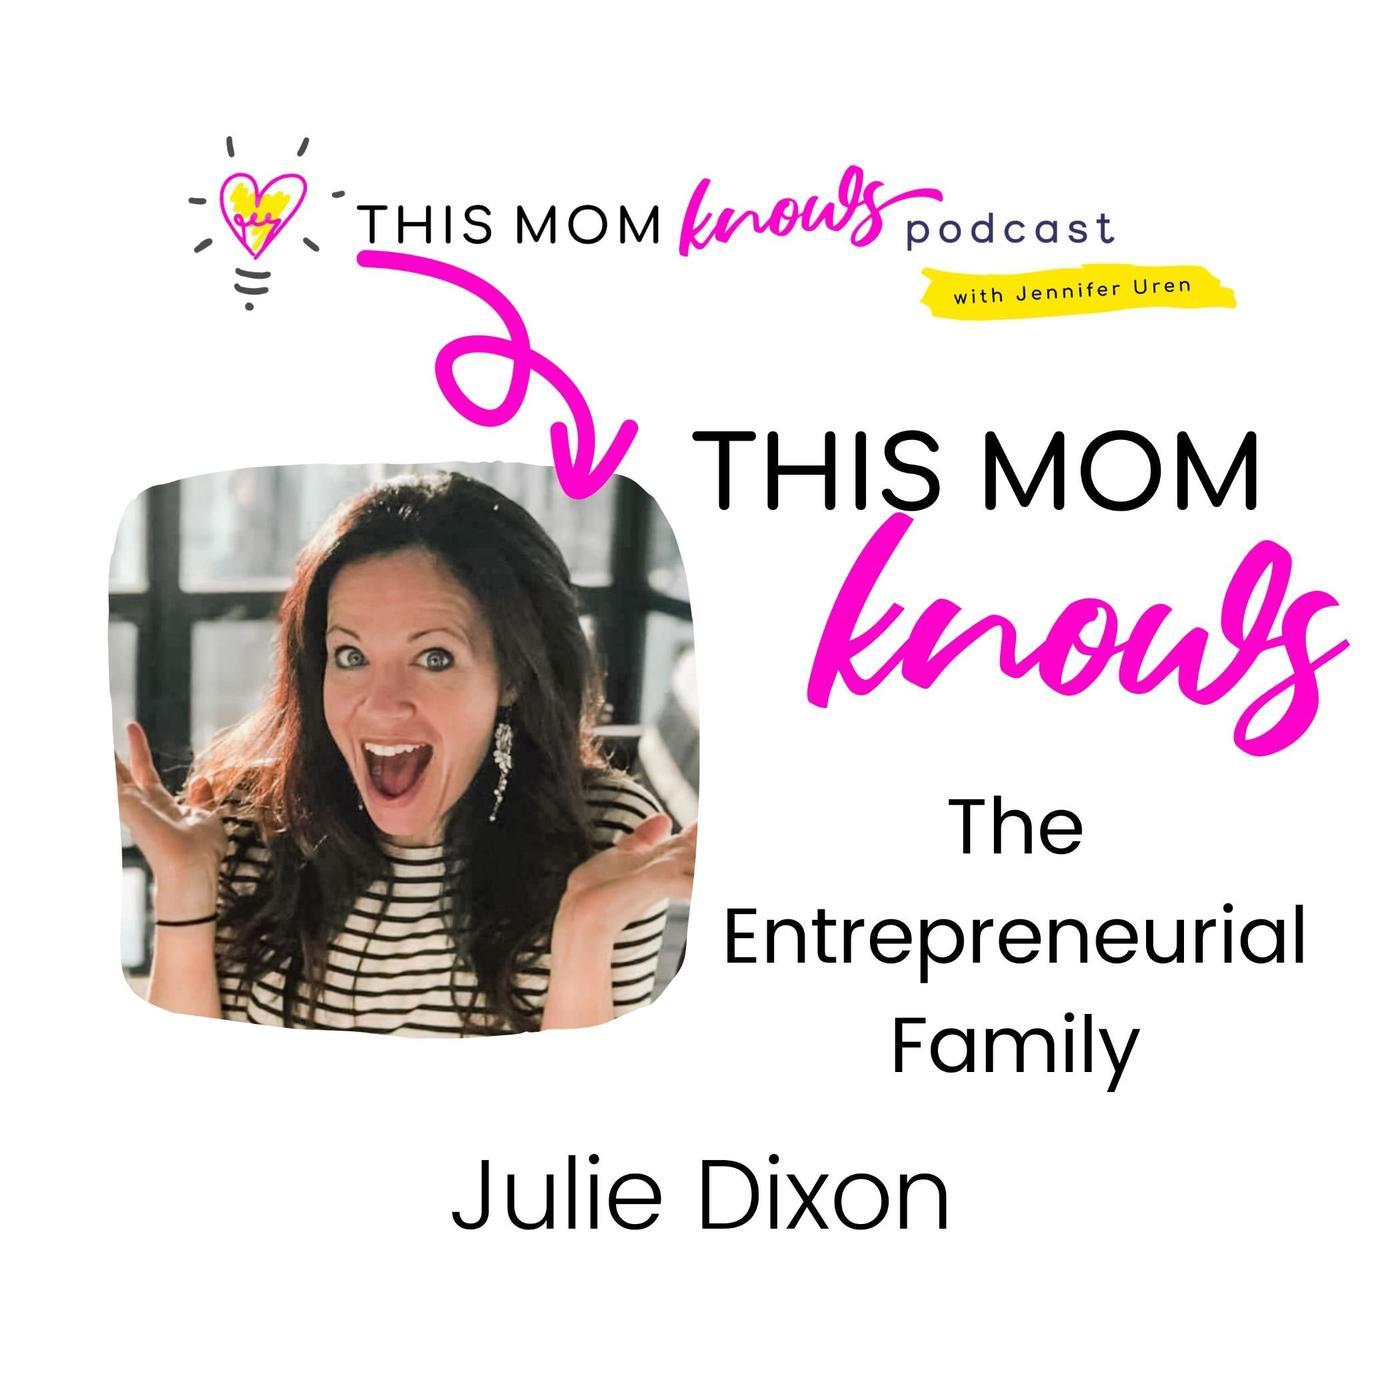 Julie Dixon on The Entrepreneurial Family